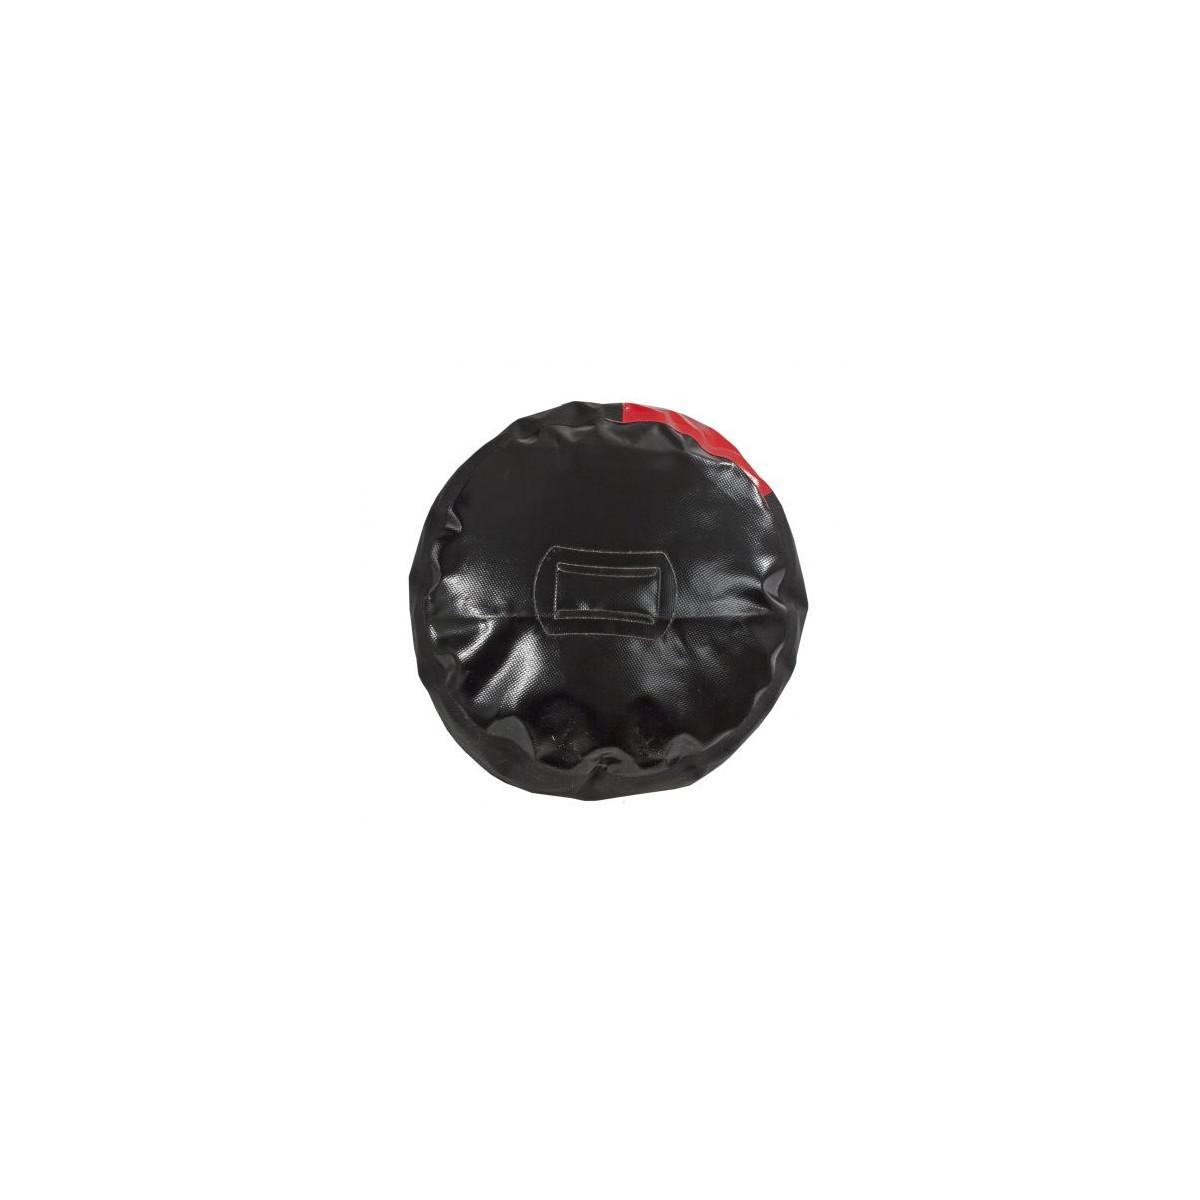 Ūdensdrošie maisi un iepakojumi Ortlieb PS 490 35 L